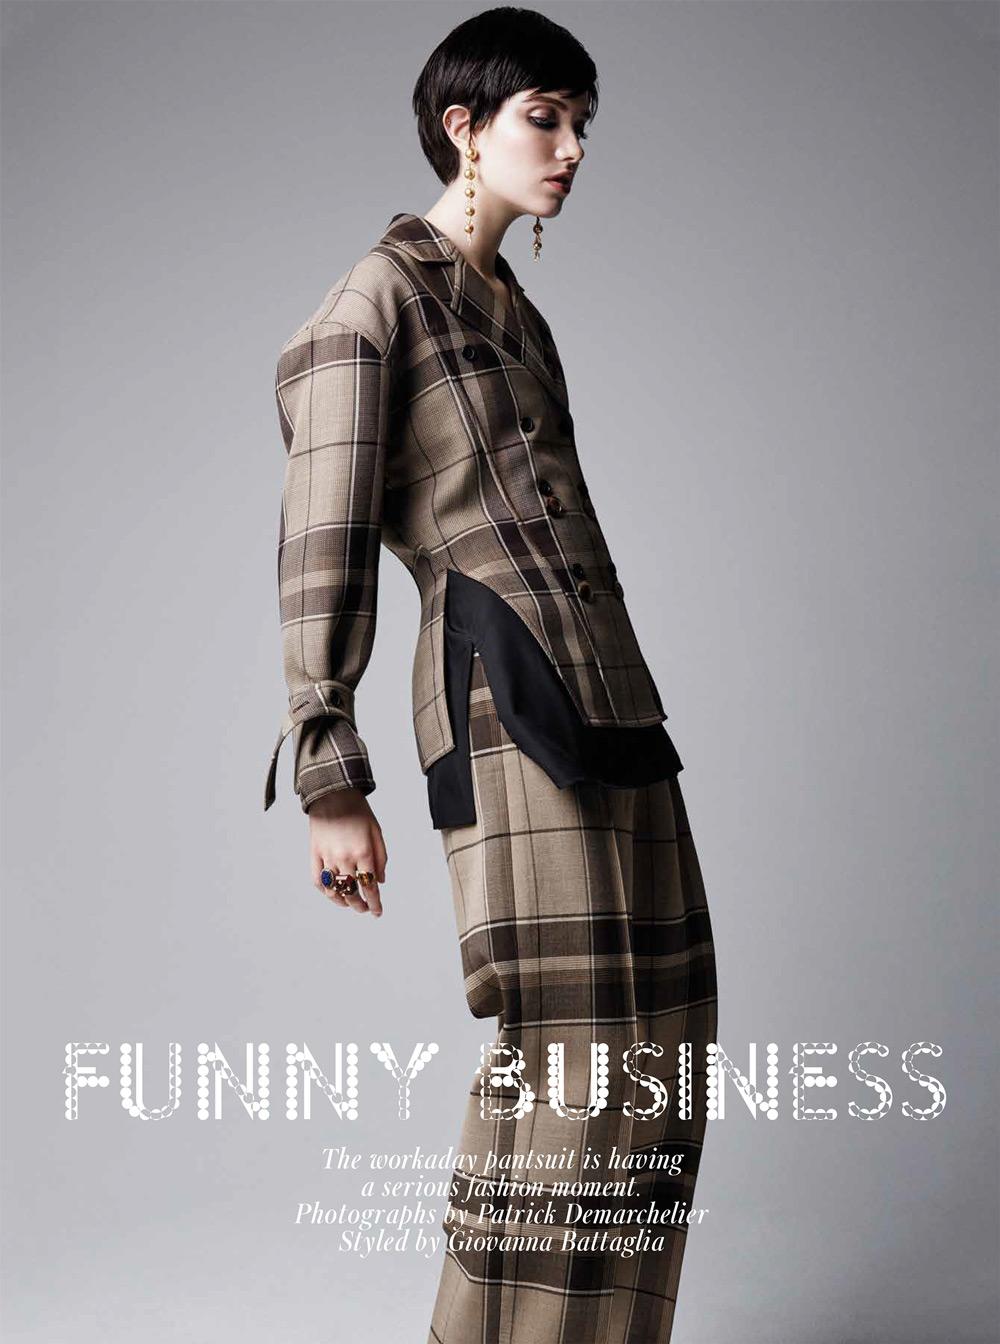 Giovanna-Battaglia-W-Magazine-Funny-Business-Patrick-Demarchelier-0.jpg